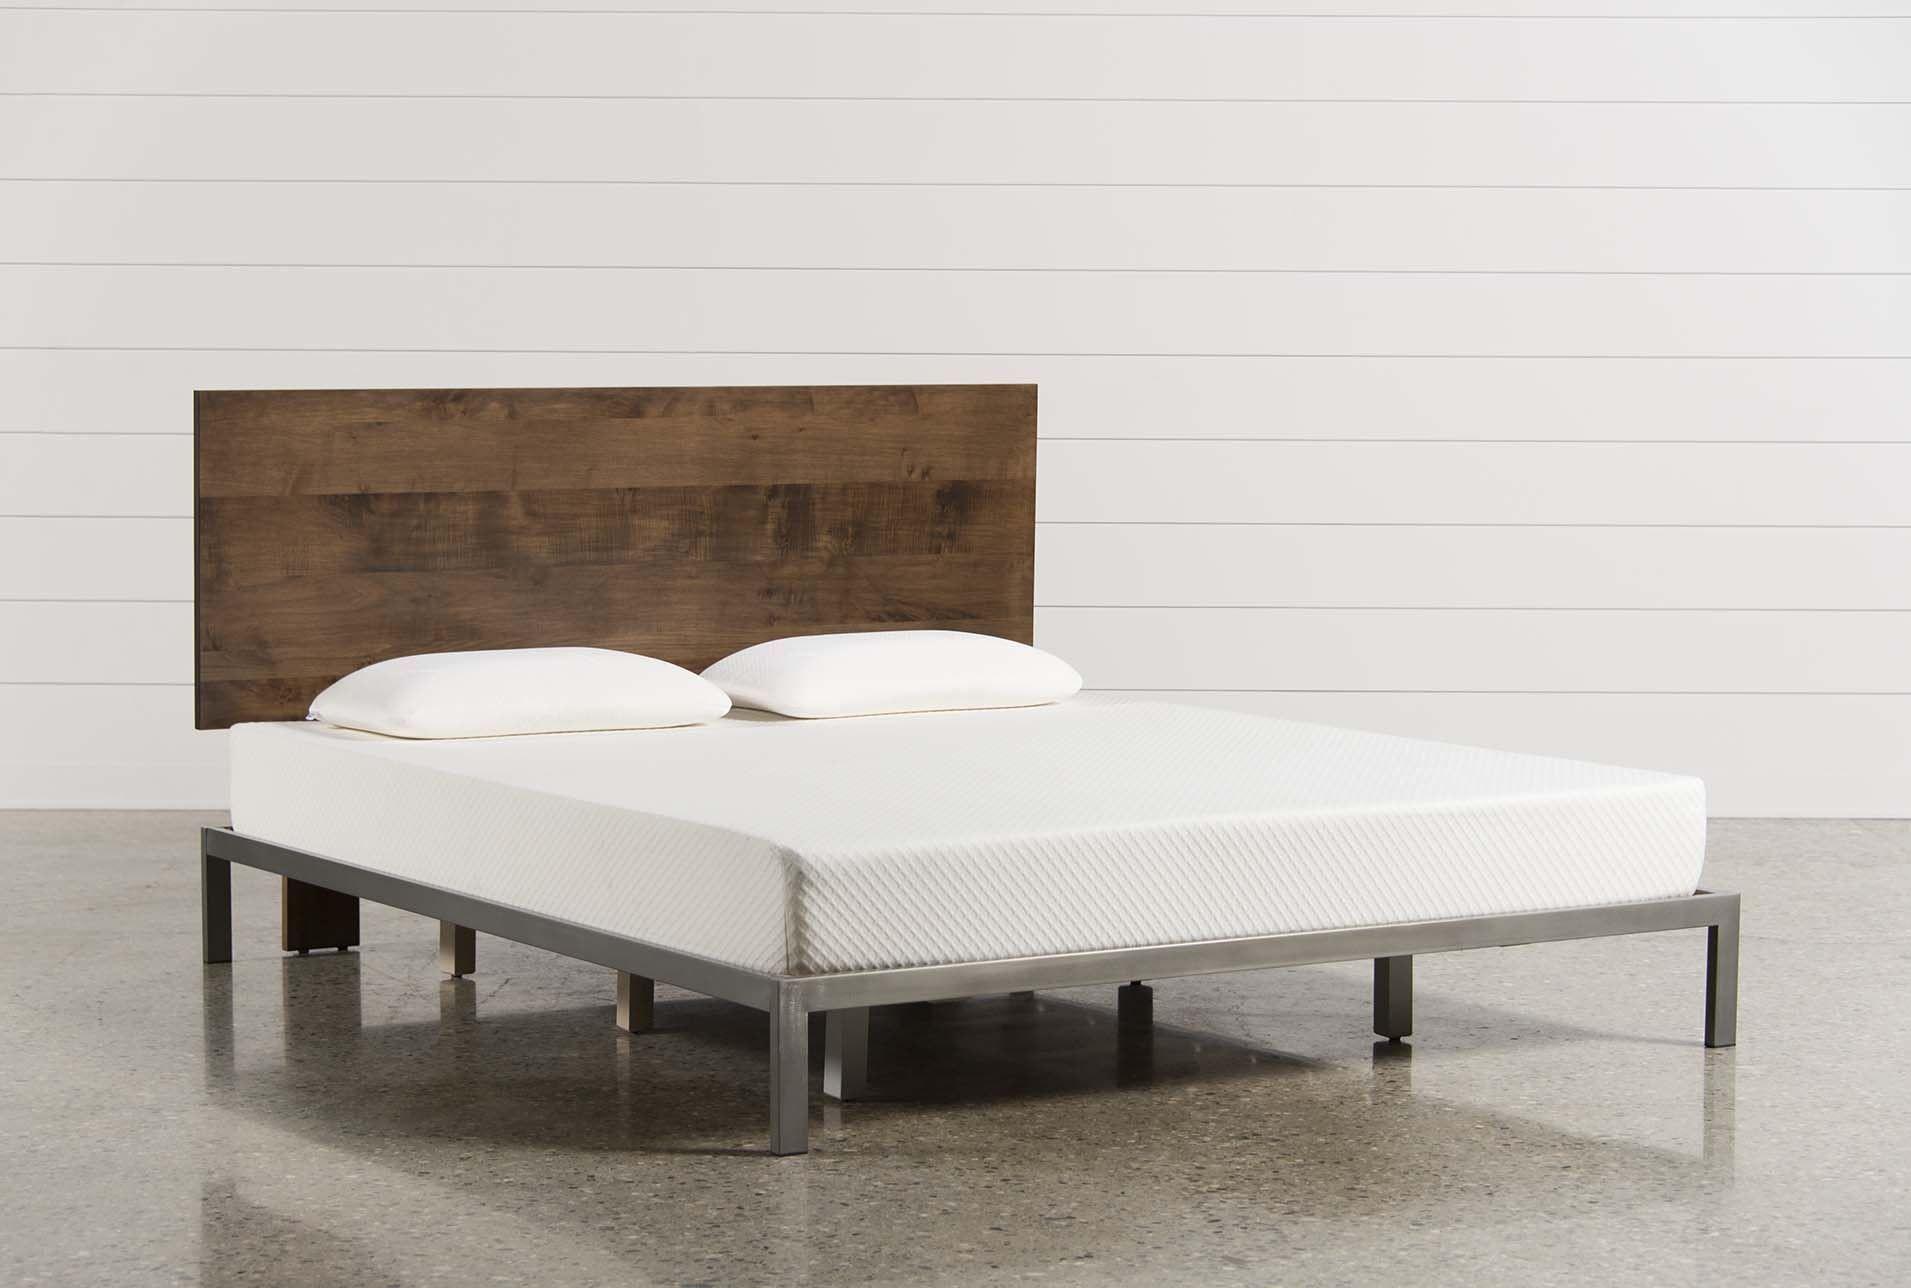 Charles P Rogers Plattform Bett Bett Ideen Kleine Wohnung Tipps